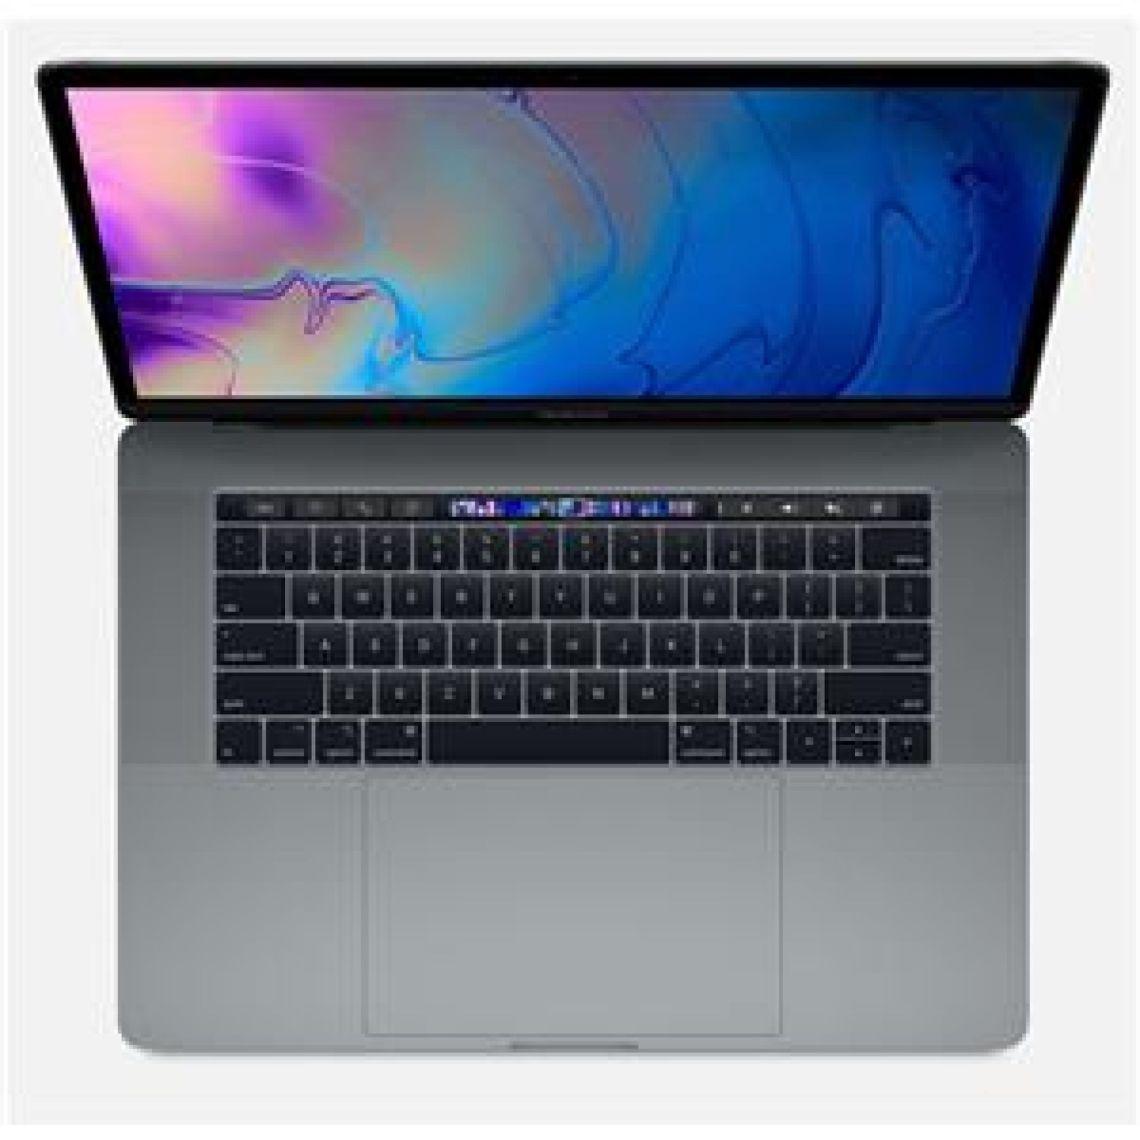 "Apple 15"" MacBook Pro, i7, 16G RAM, 512GB SSD, macOS High Sierra, Space Gray"